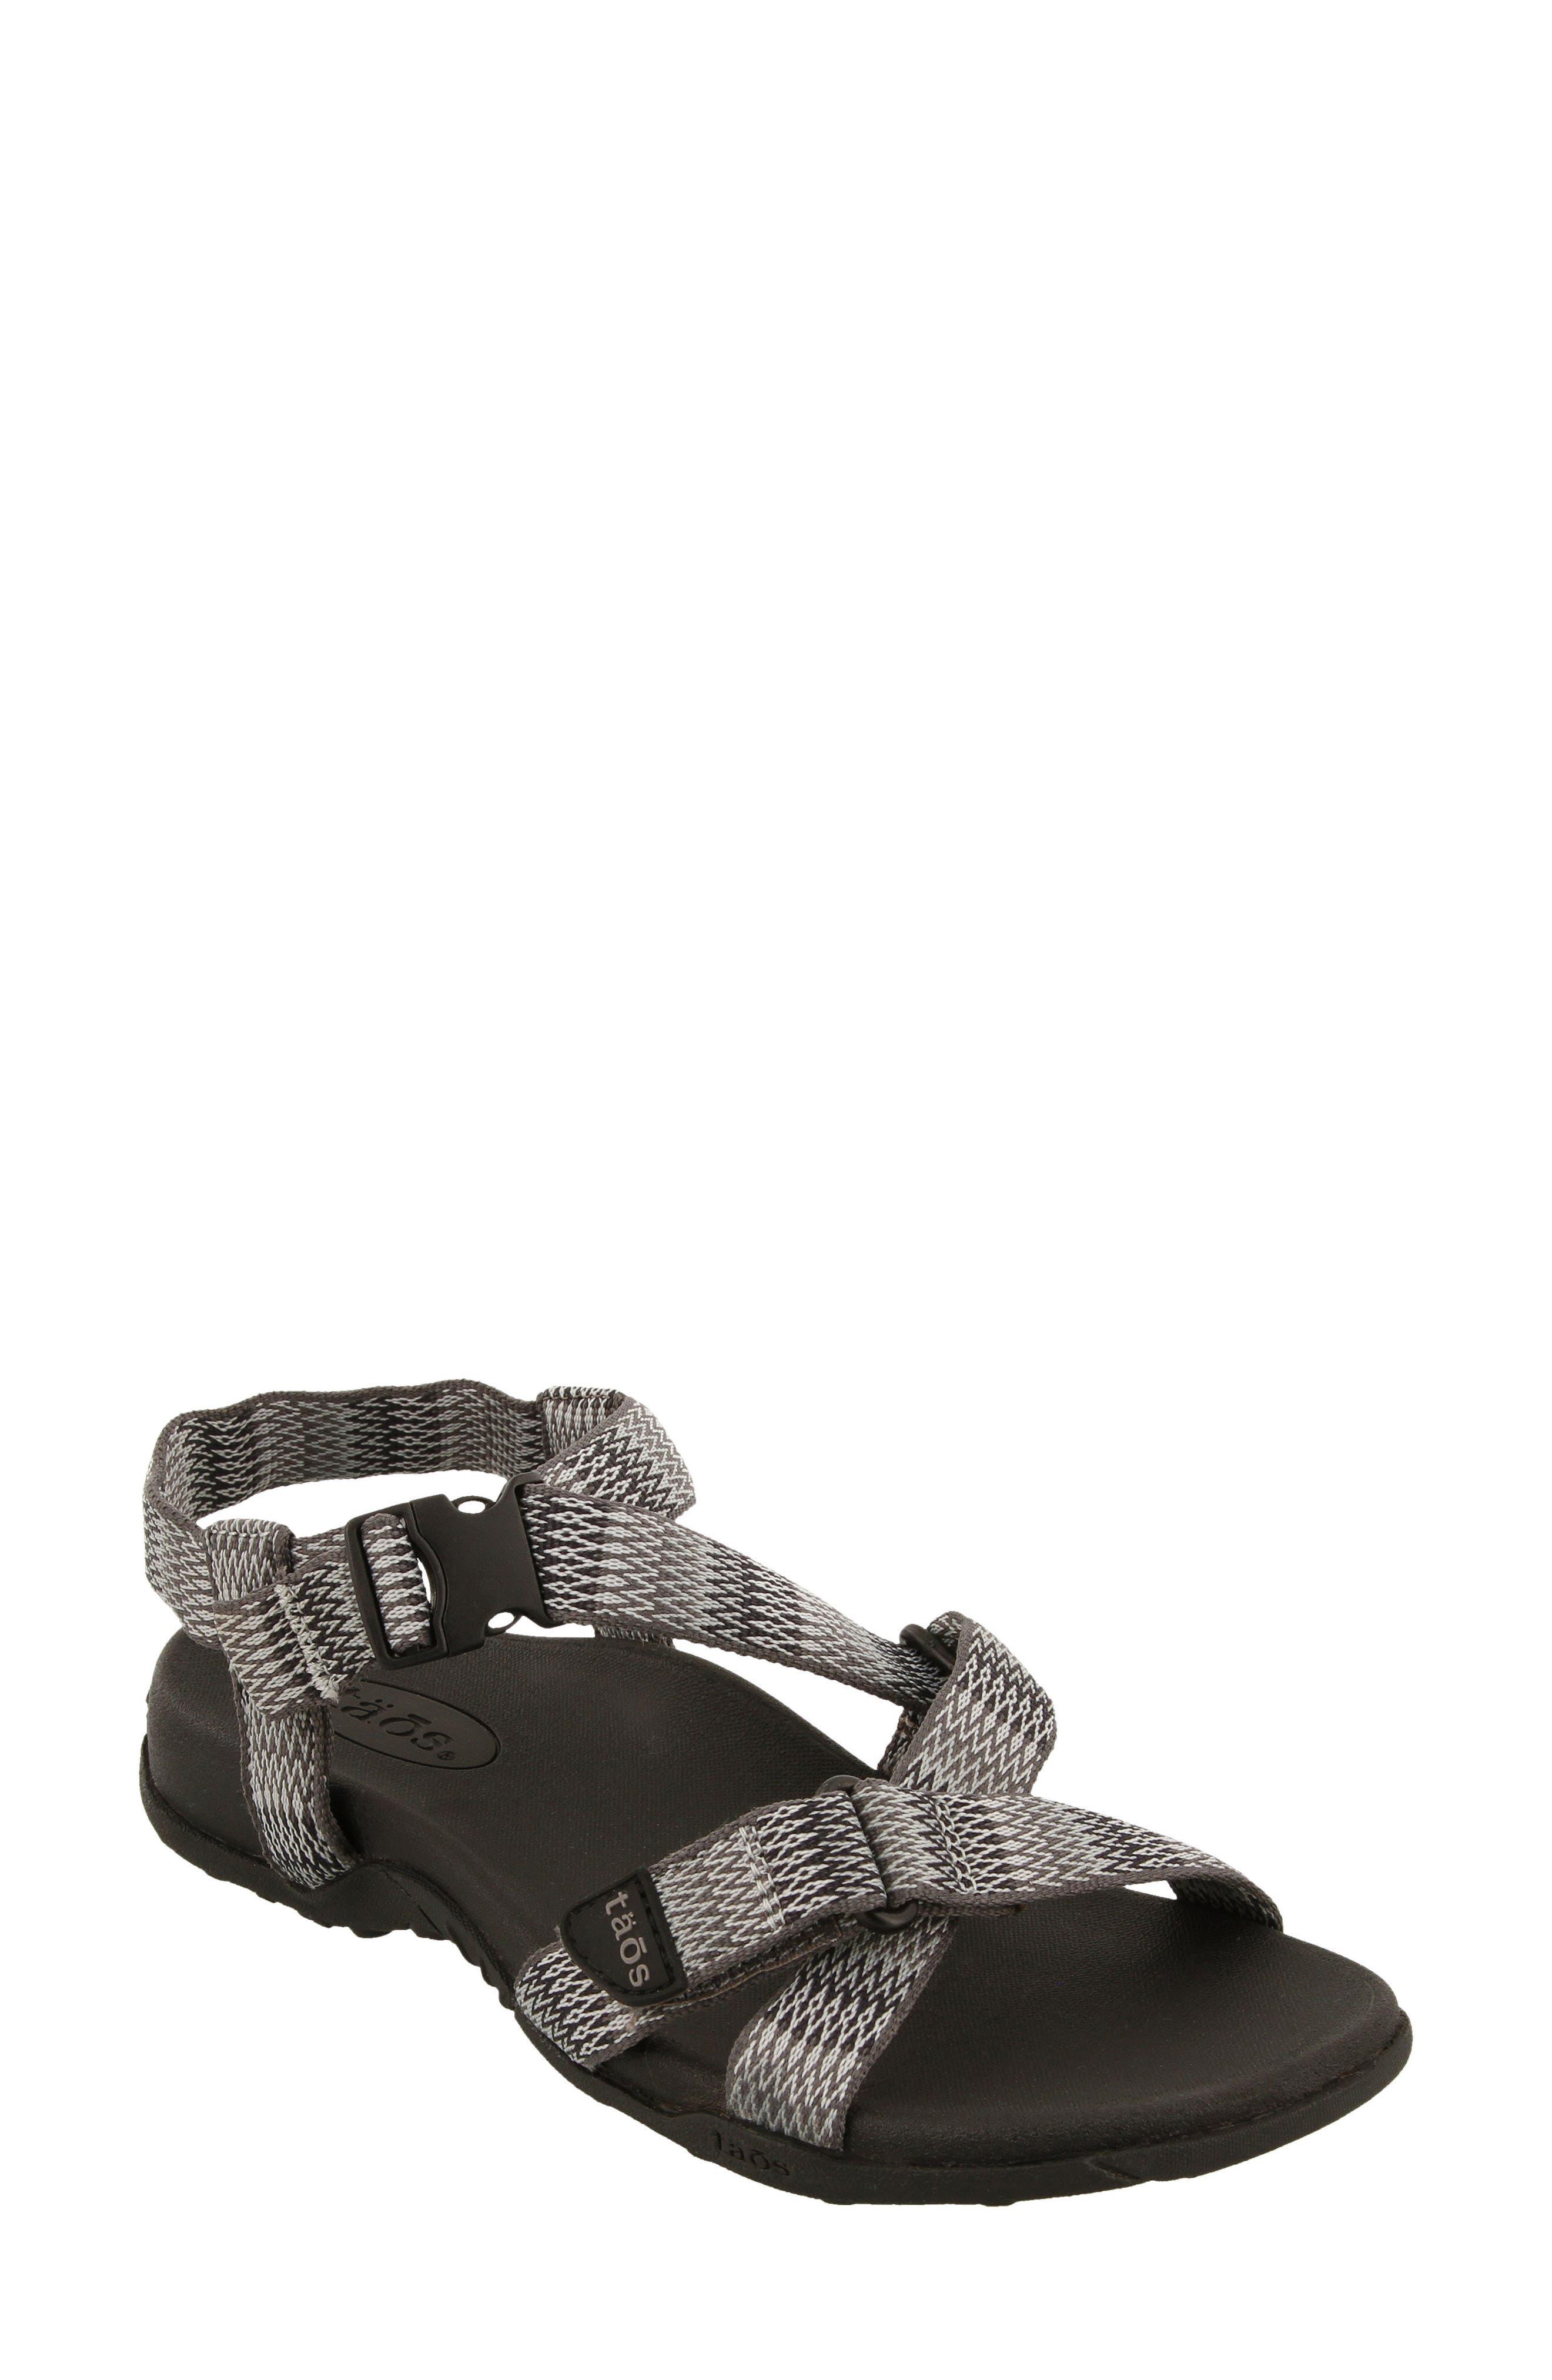 New Wave Sandal,                         Main,                         color, BLACK FABRIC